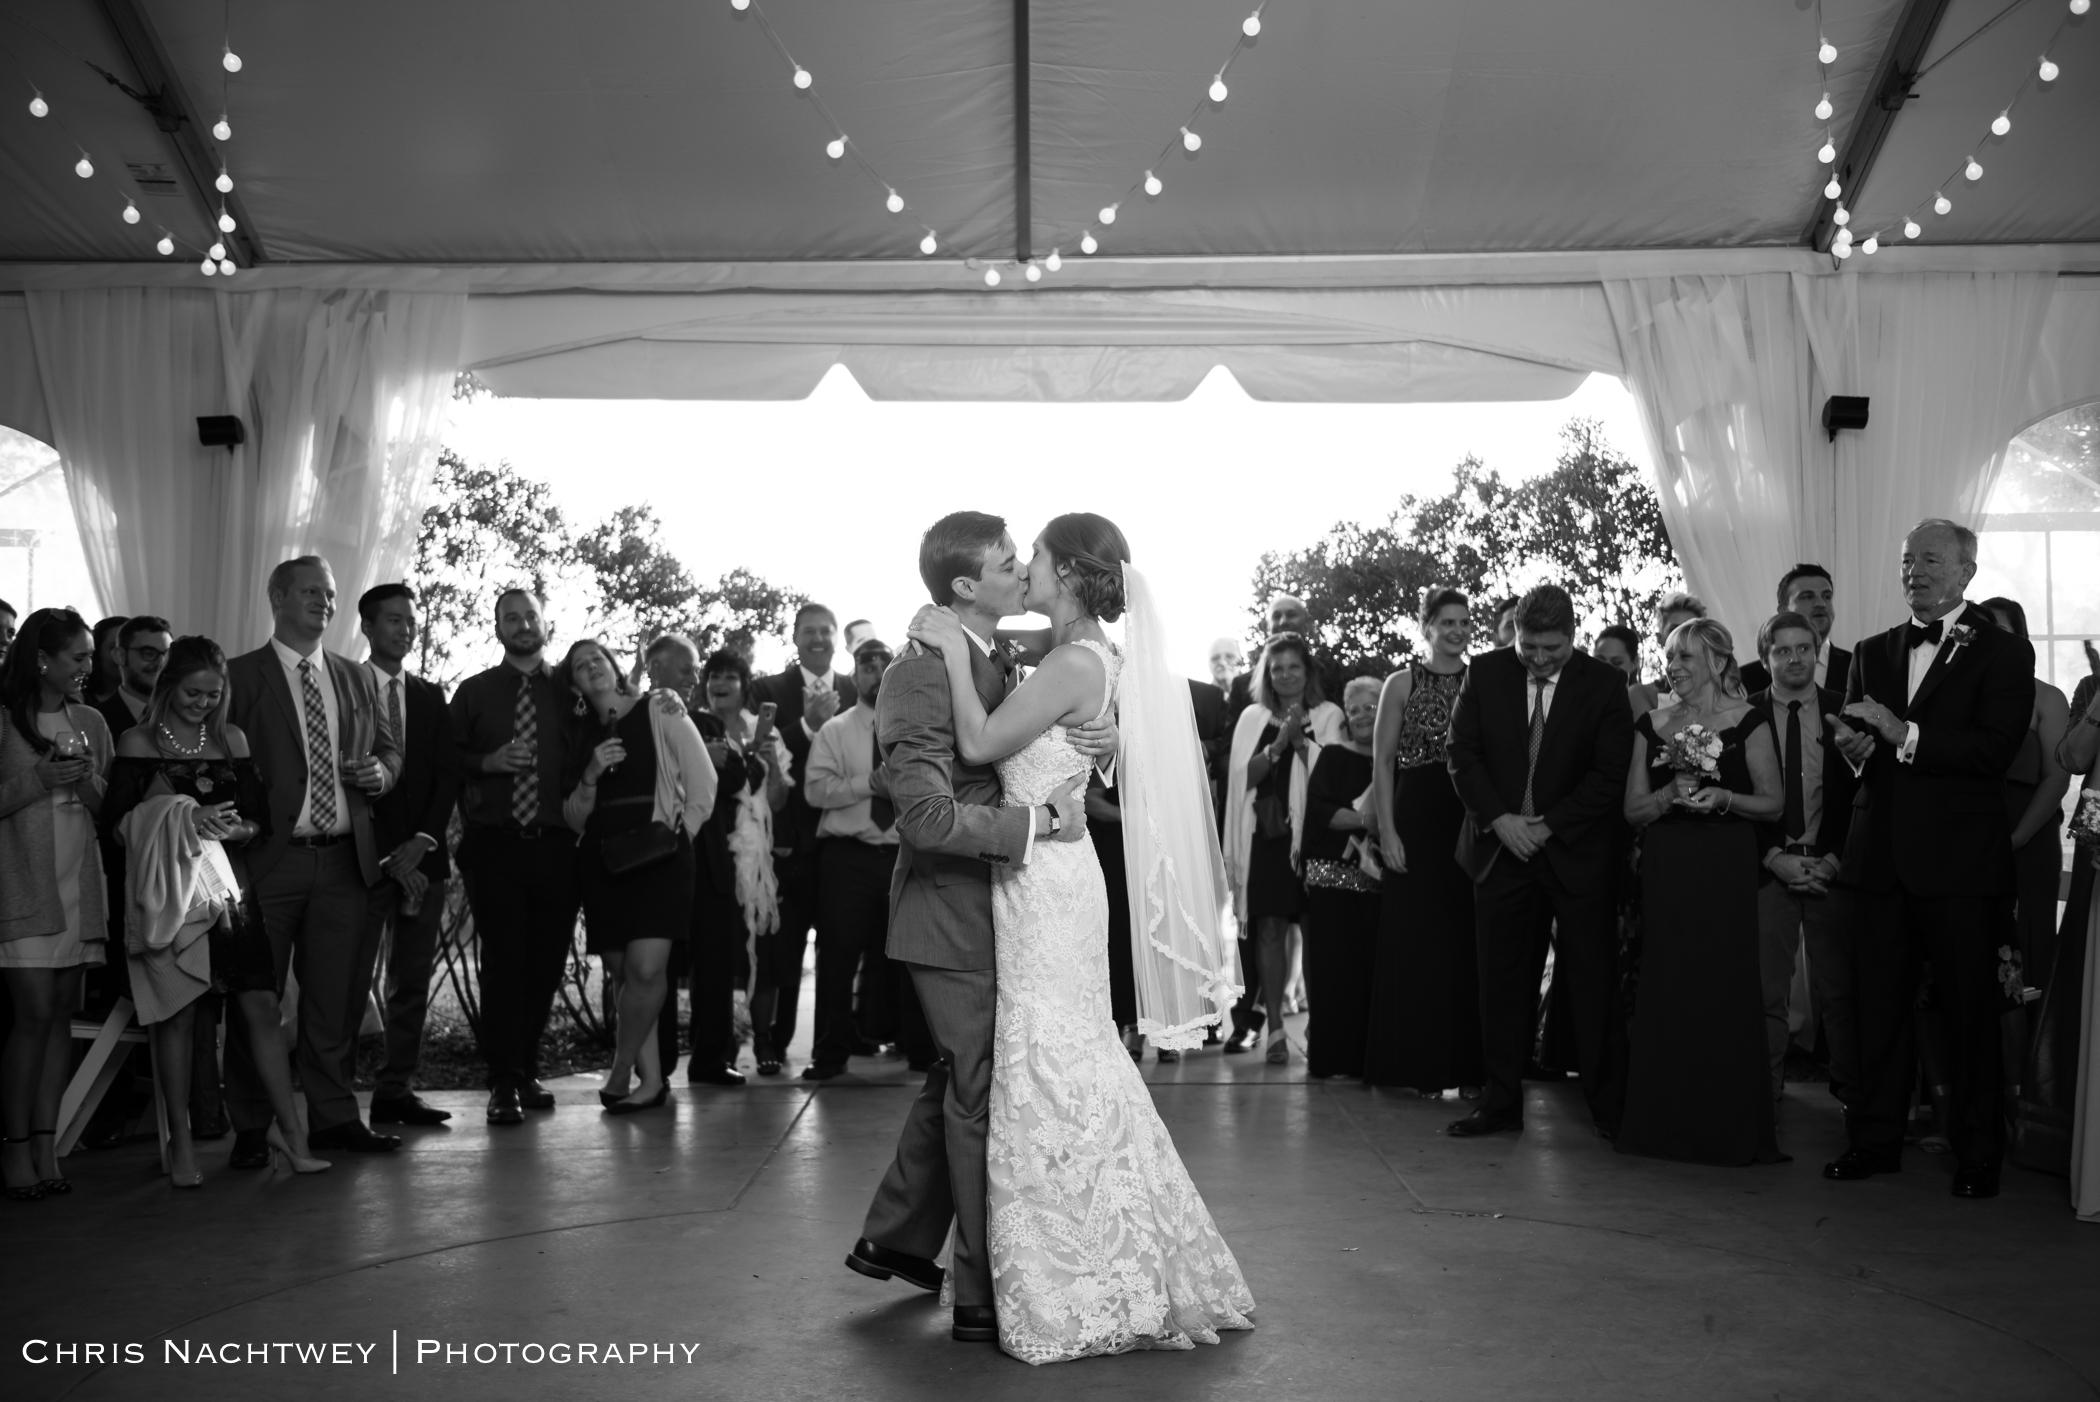 harkness-wedding-photos-chris-nachtwey-photography-2018-26.jpg